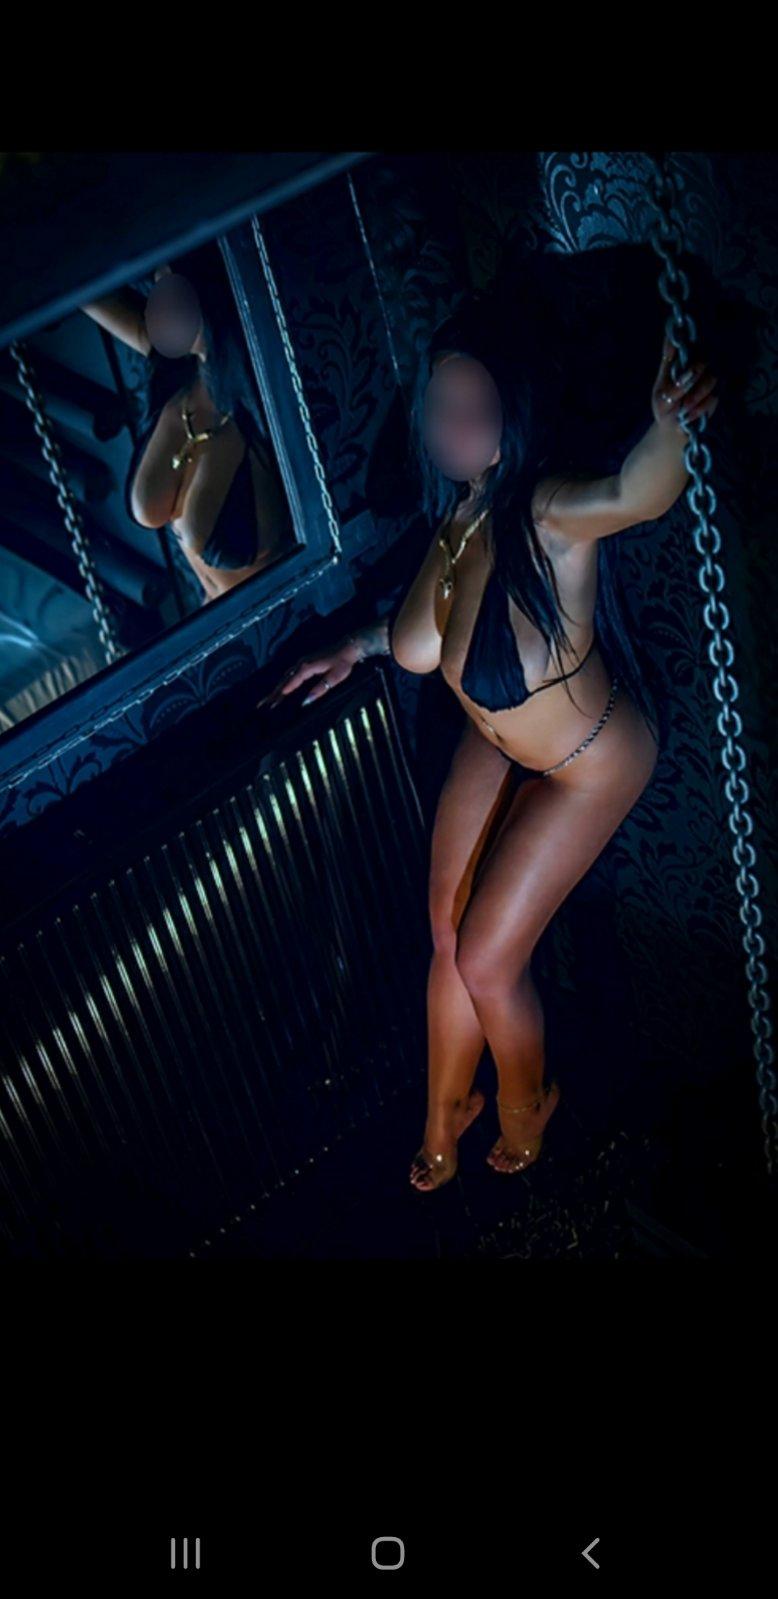 vip-escort-girl Morena